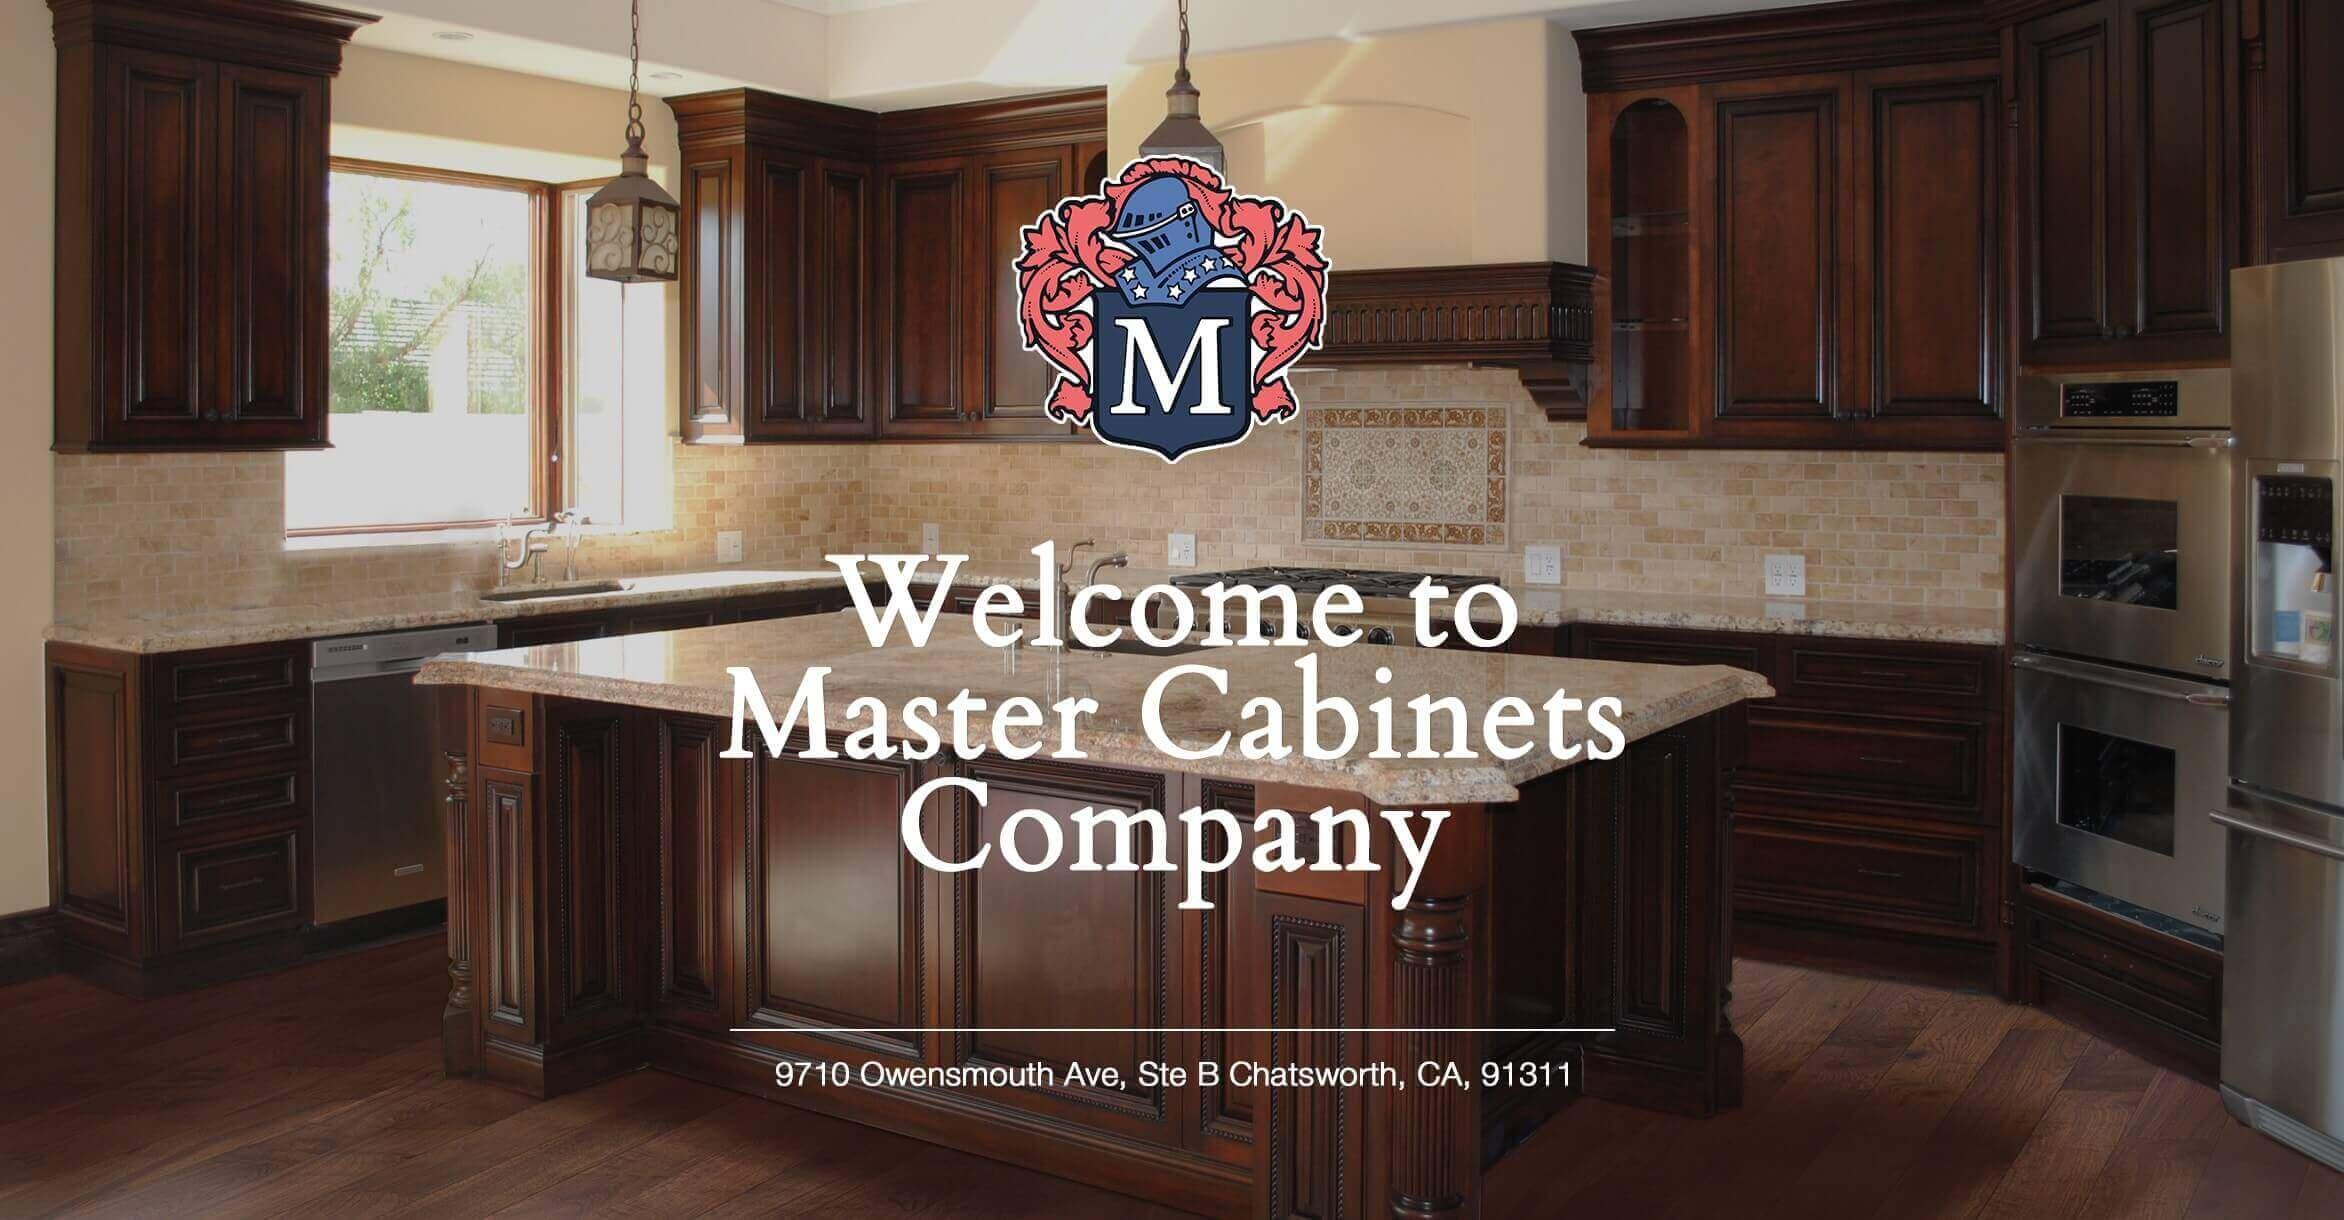 Home | Mastercabinets.com